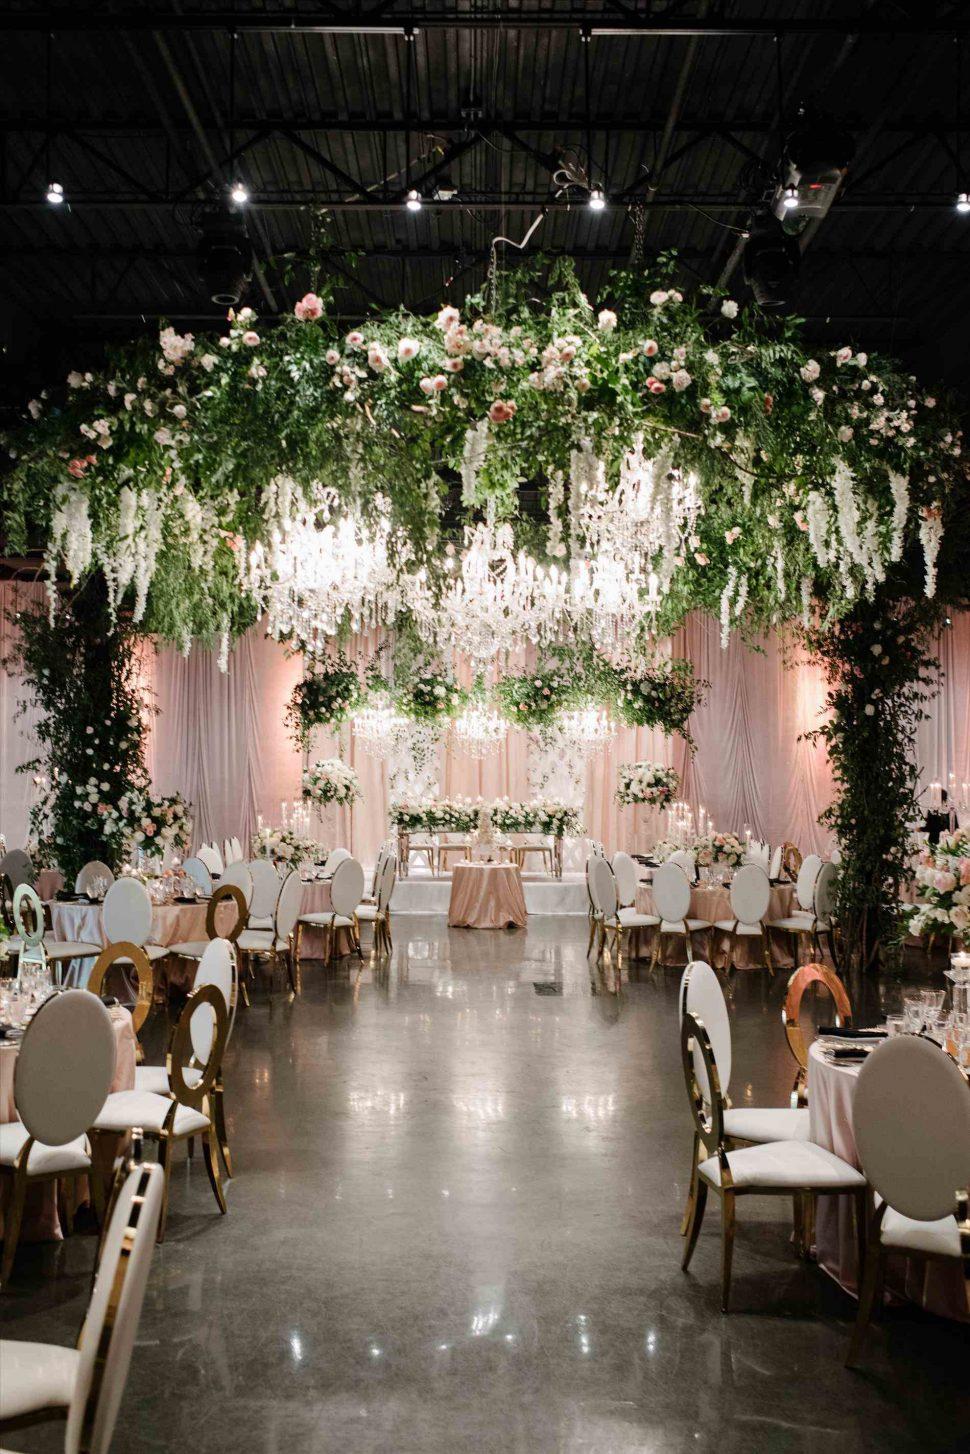 indoor-garden-wedding-decor-outdoor-venues-ideas-klang-valley-reception-theme-featured-s-from-rebecca-chan-970x1454.jpg